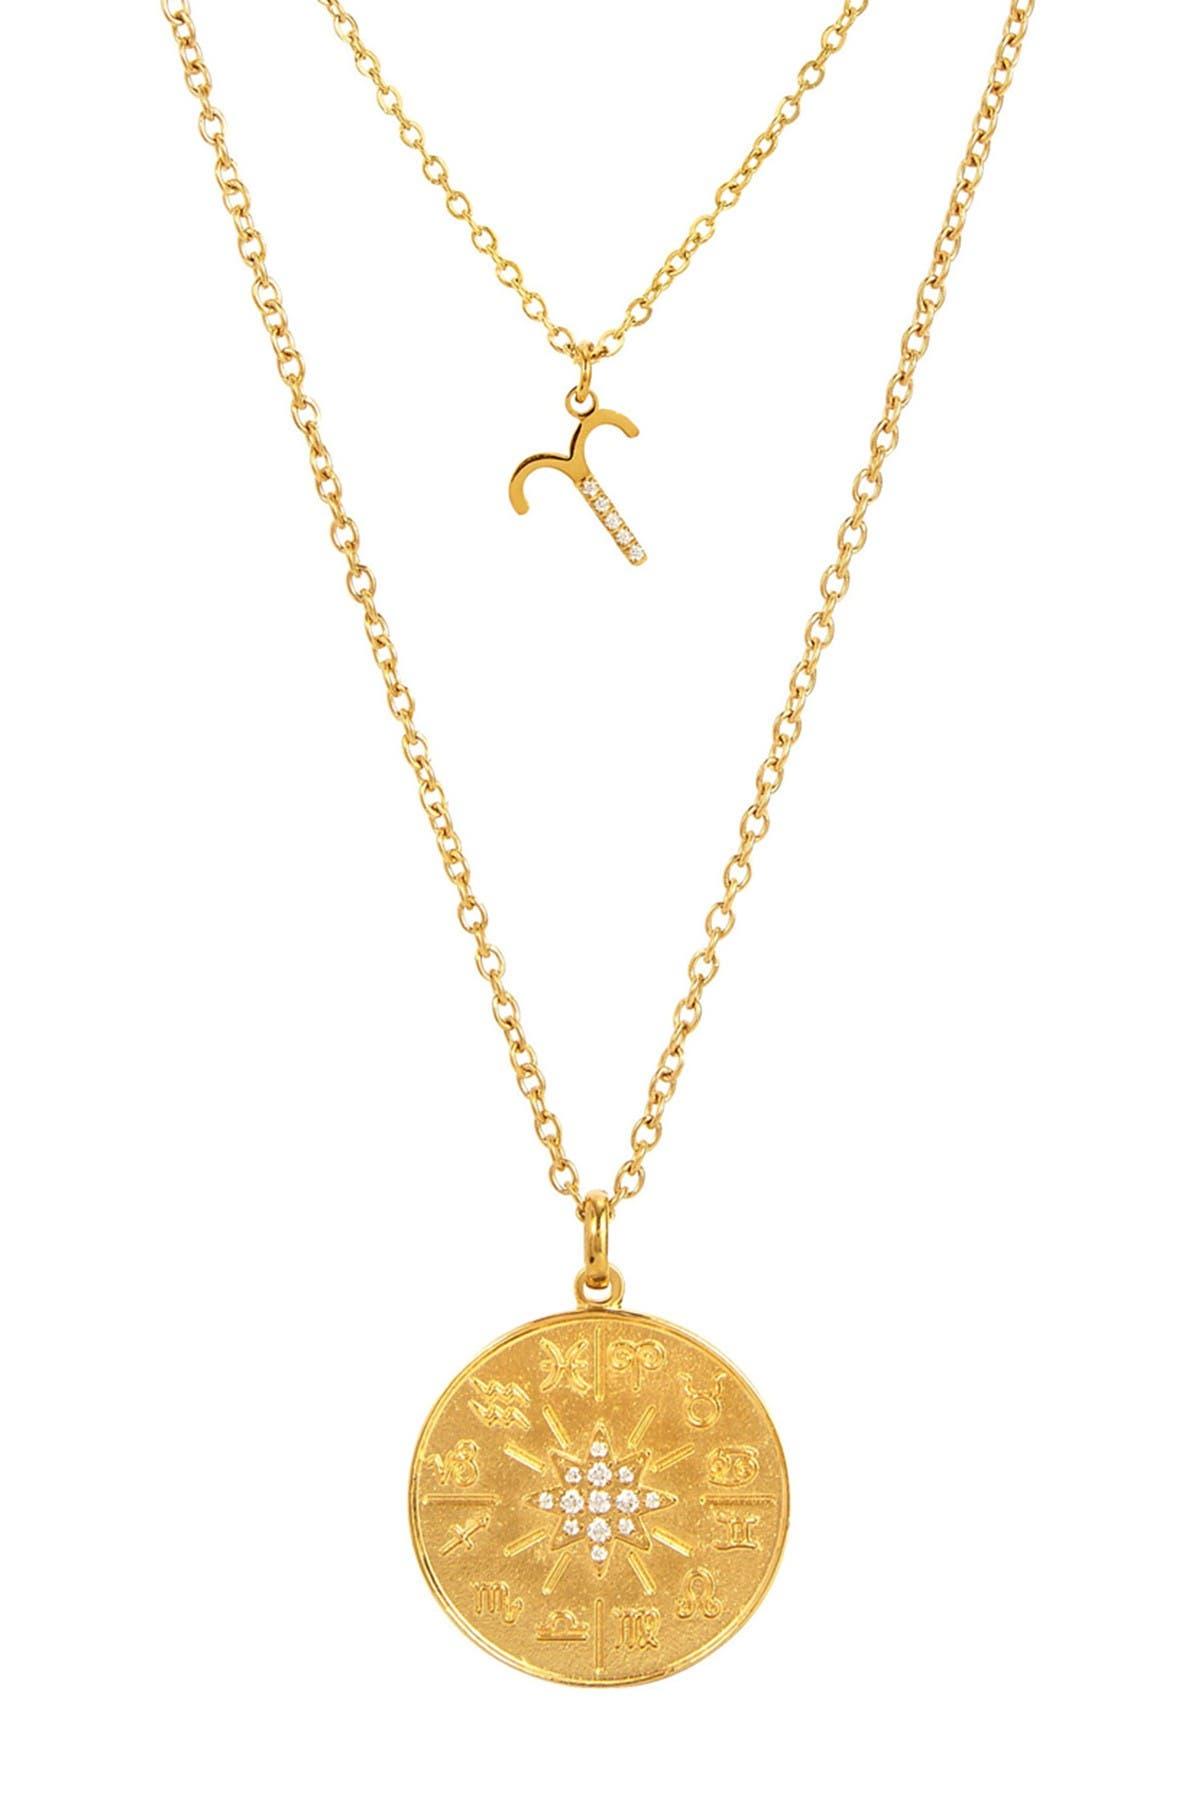 24 Zodiac layered gold necklace..free shipping !!